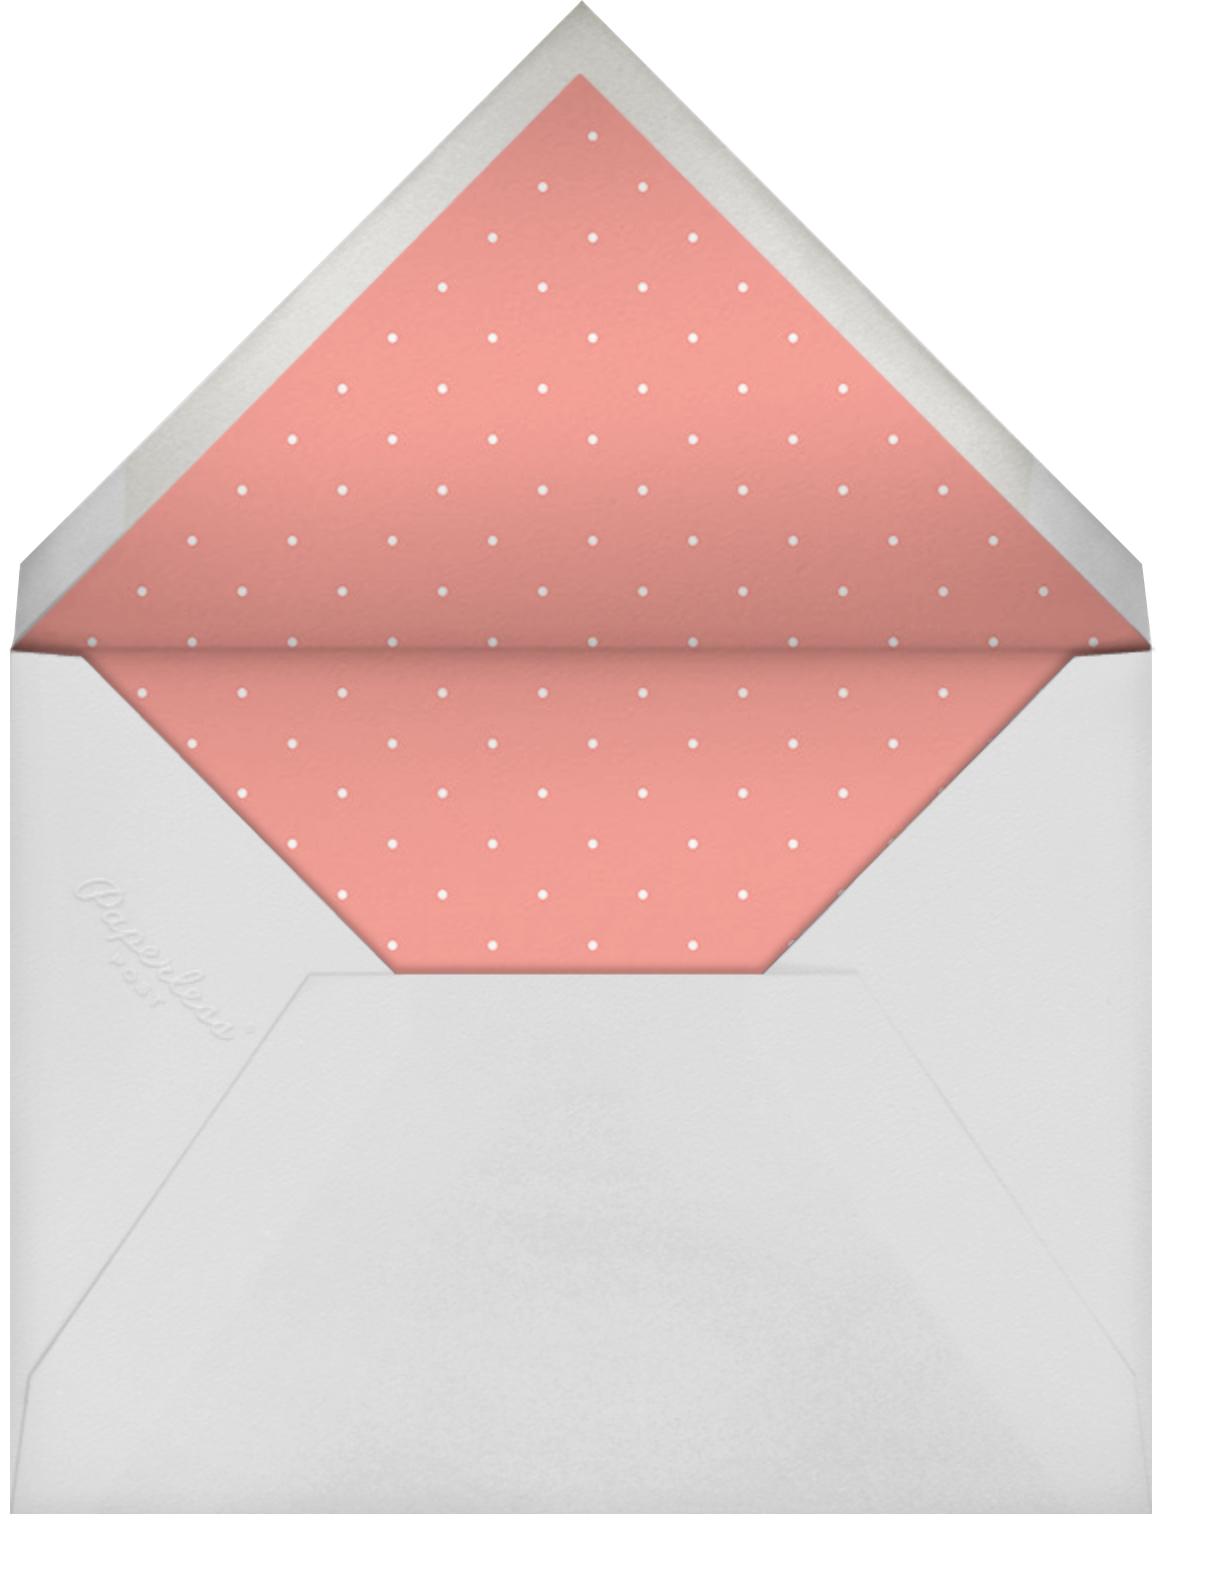 Rainbow Brights - Pastels - Mr. Boddington's Studio - Envelope